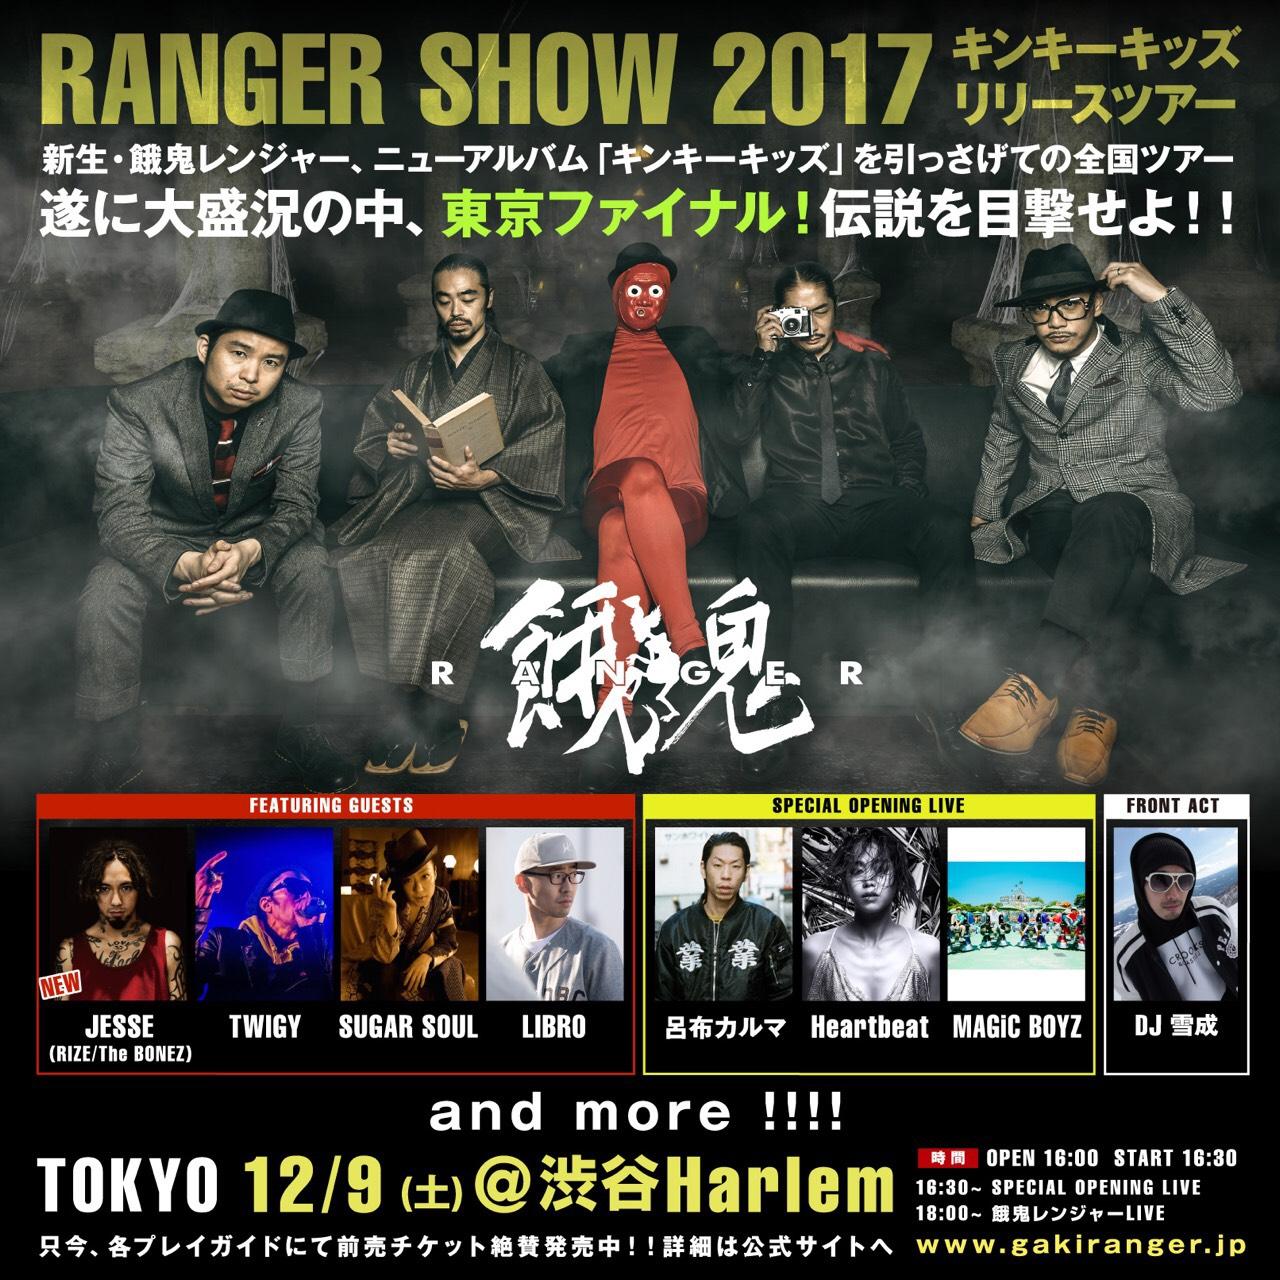 http://jcctokyo.com/news/RangerSho2017inTokyo.jpg